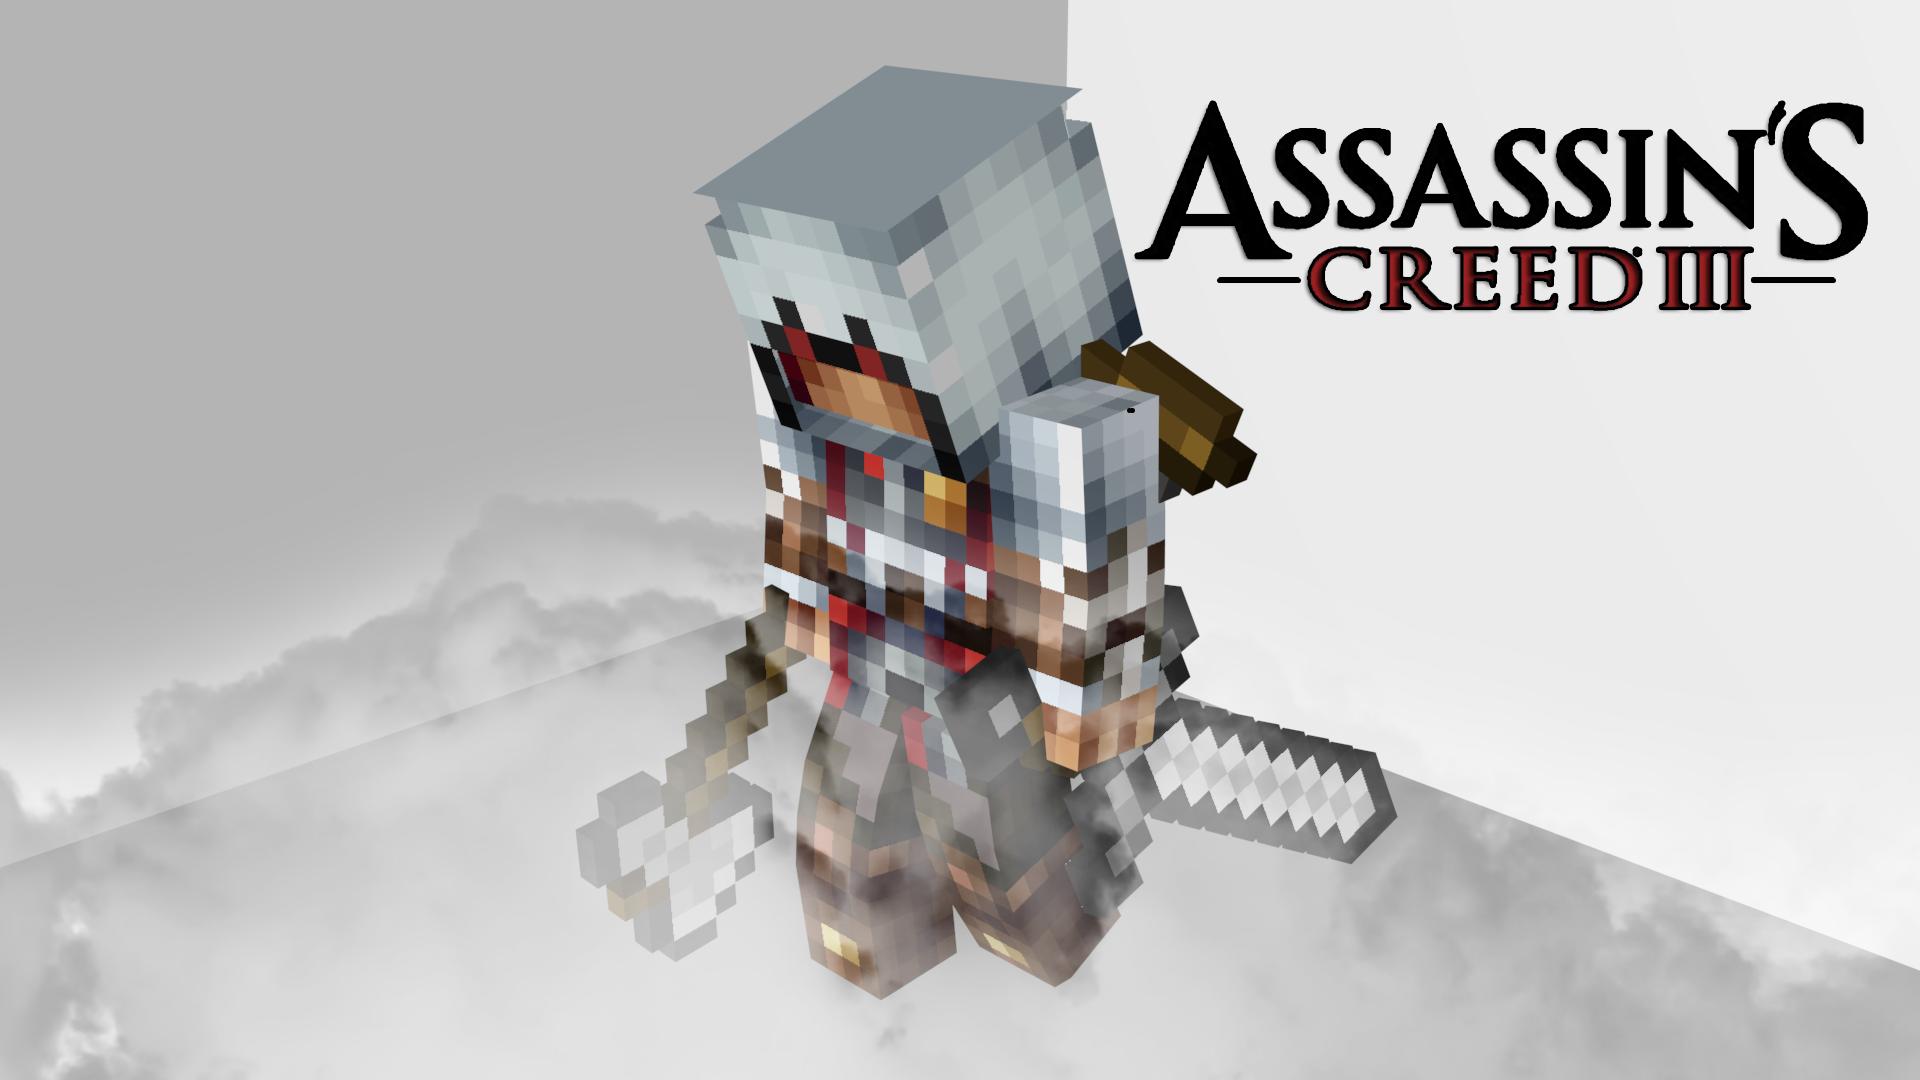 Amazing Wallpaper Minecraft Assassin - wallpaper_assassin_s_minecraft_by_maxencecraft-d7n73f0  Gallery_5199.png